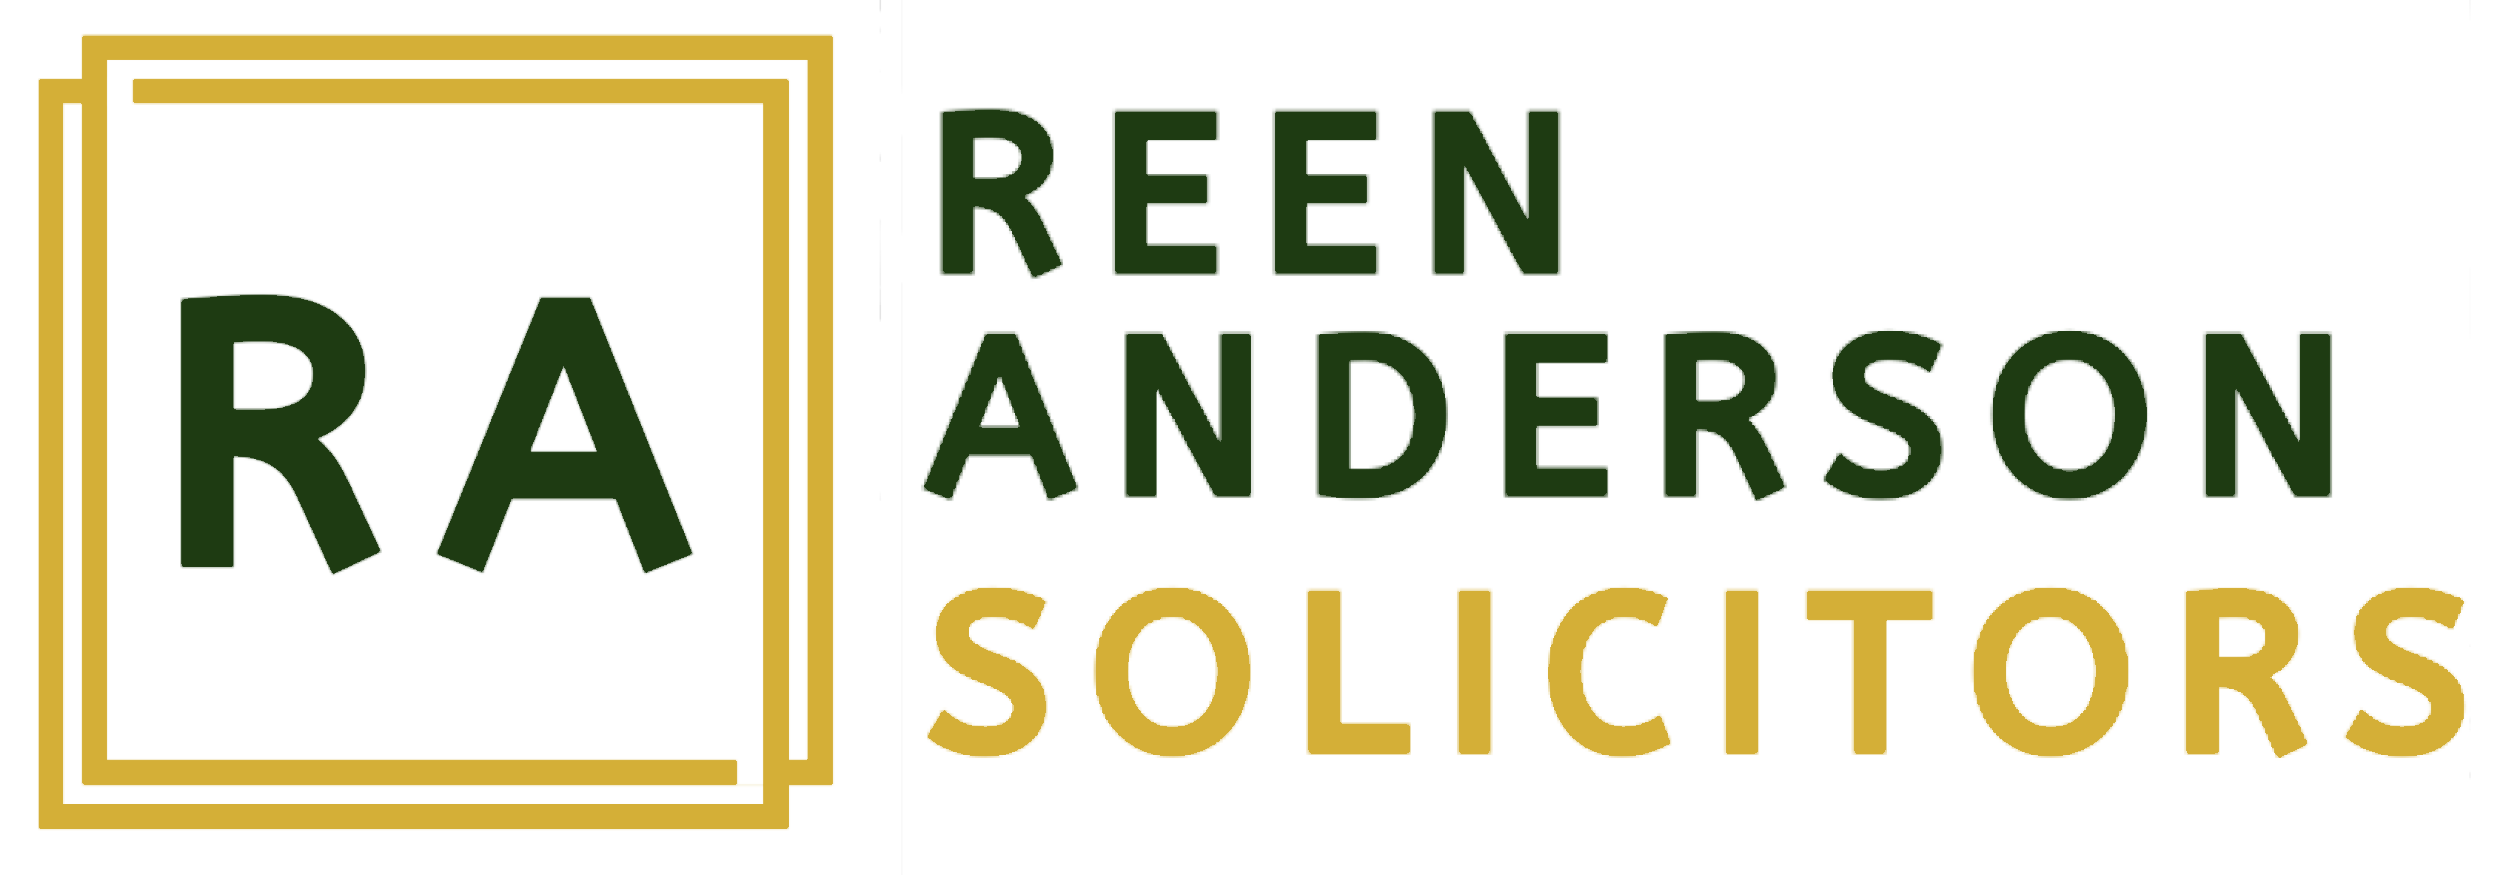 Reen Anderson Solicitors